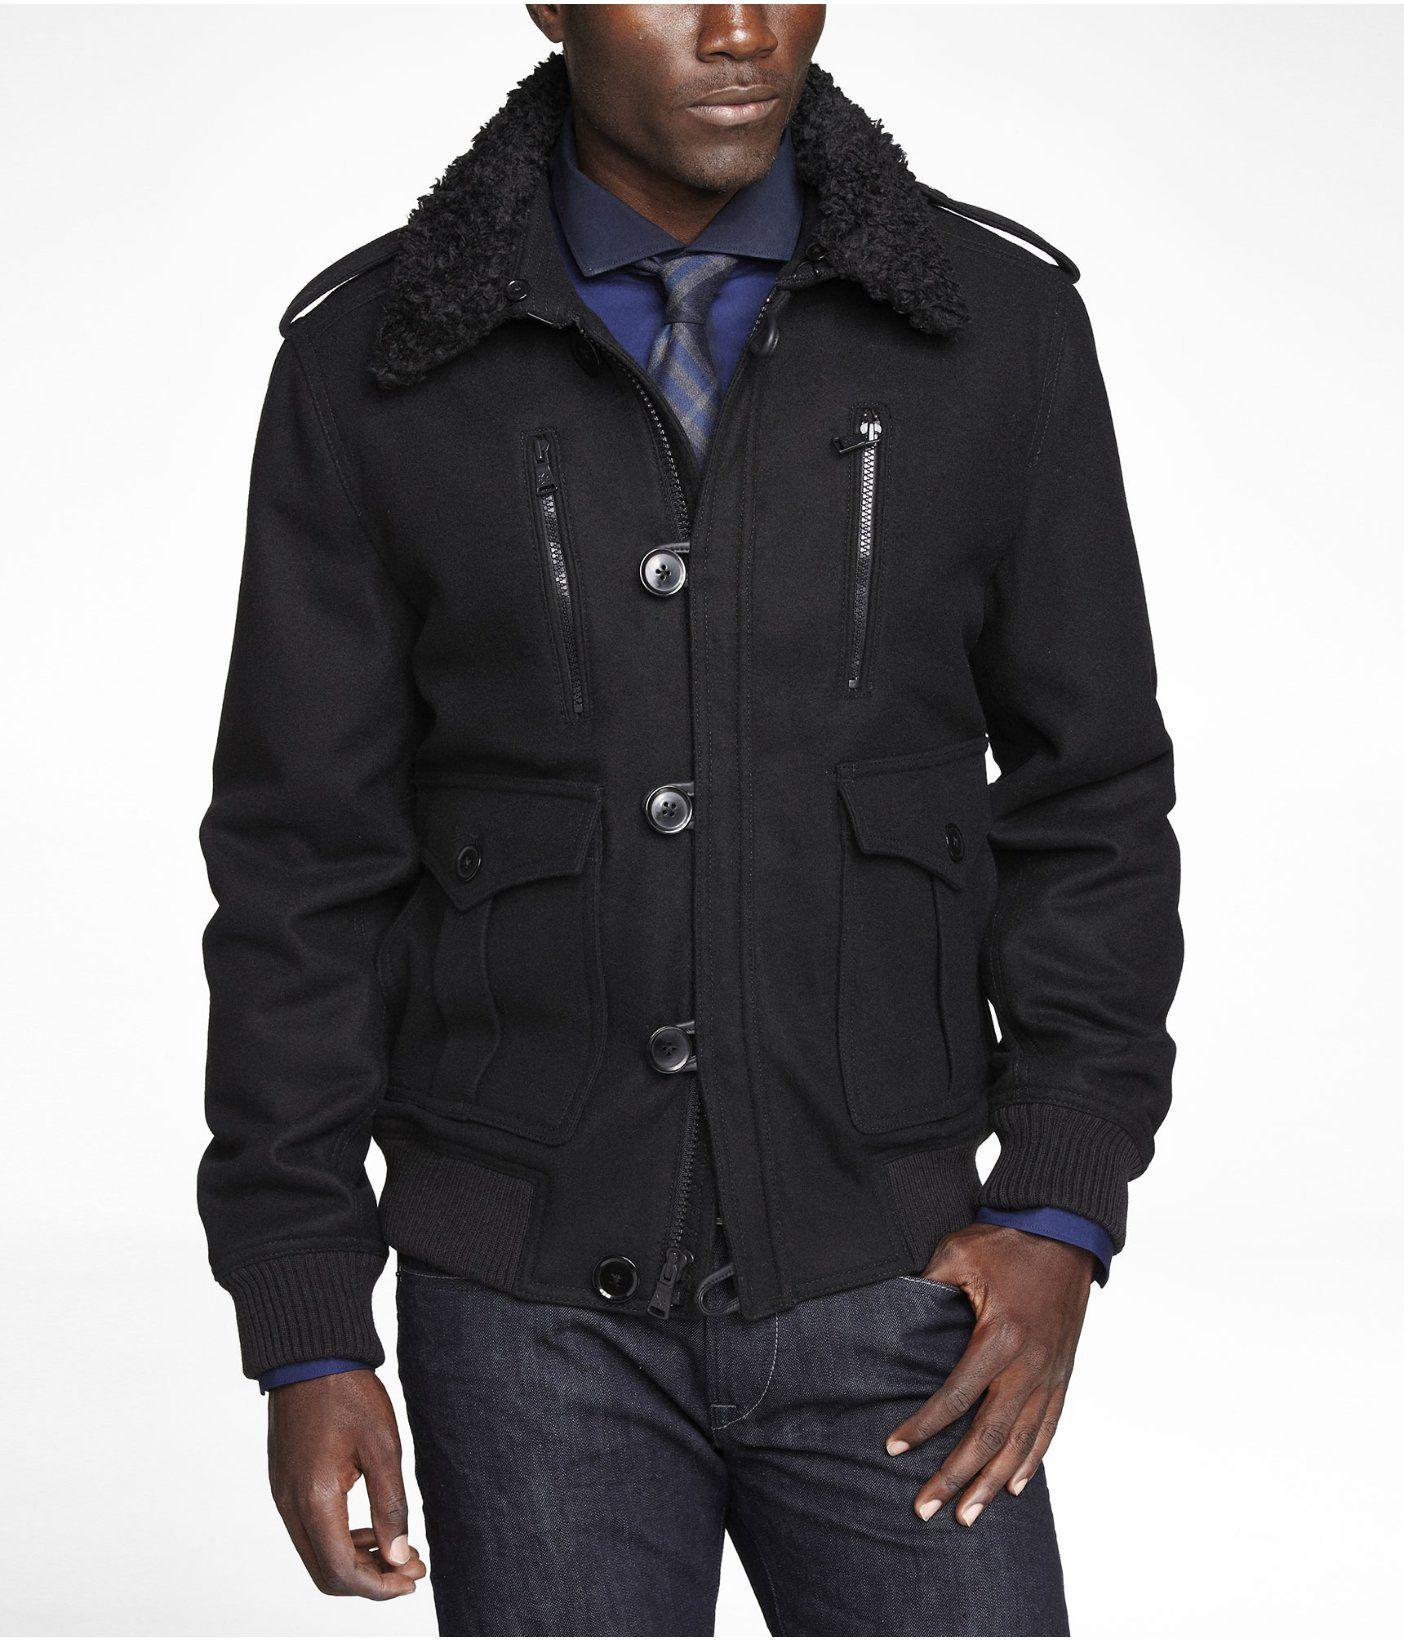 Wool Blend Faux Fur Collar Bomber Jacket Express Stylish Mens Outfits Express Outfits Mens Outfits [ 1640 x 1404 Pixel ]